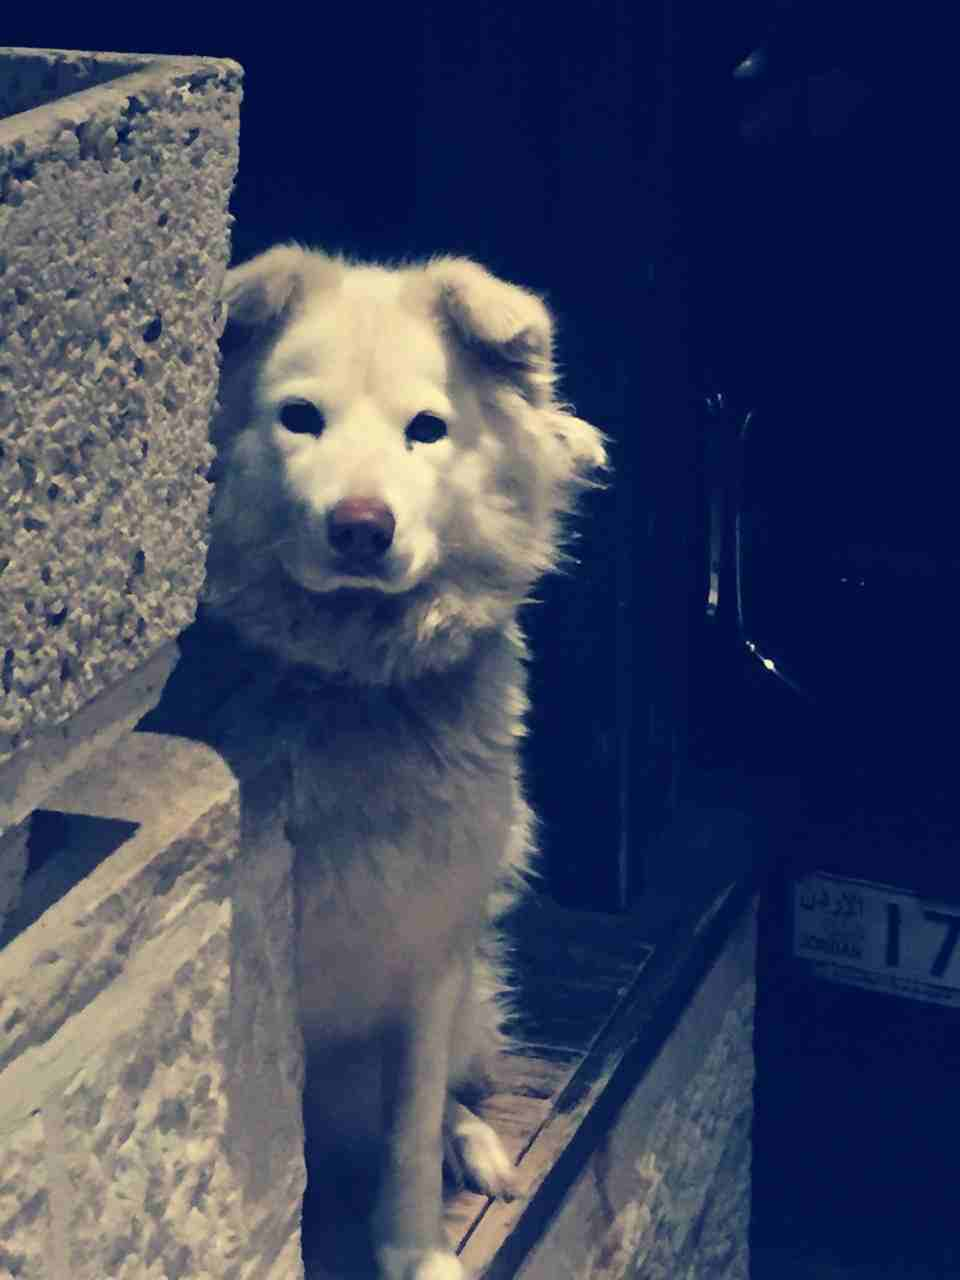 rottweiler for sale male full friendly-  جيرمن شيبرد أبيض كندي لا...